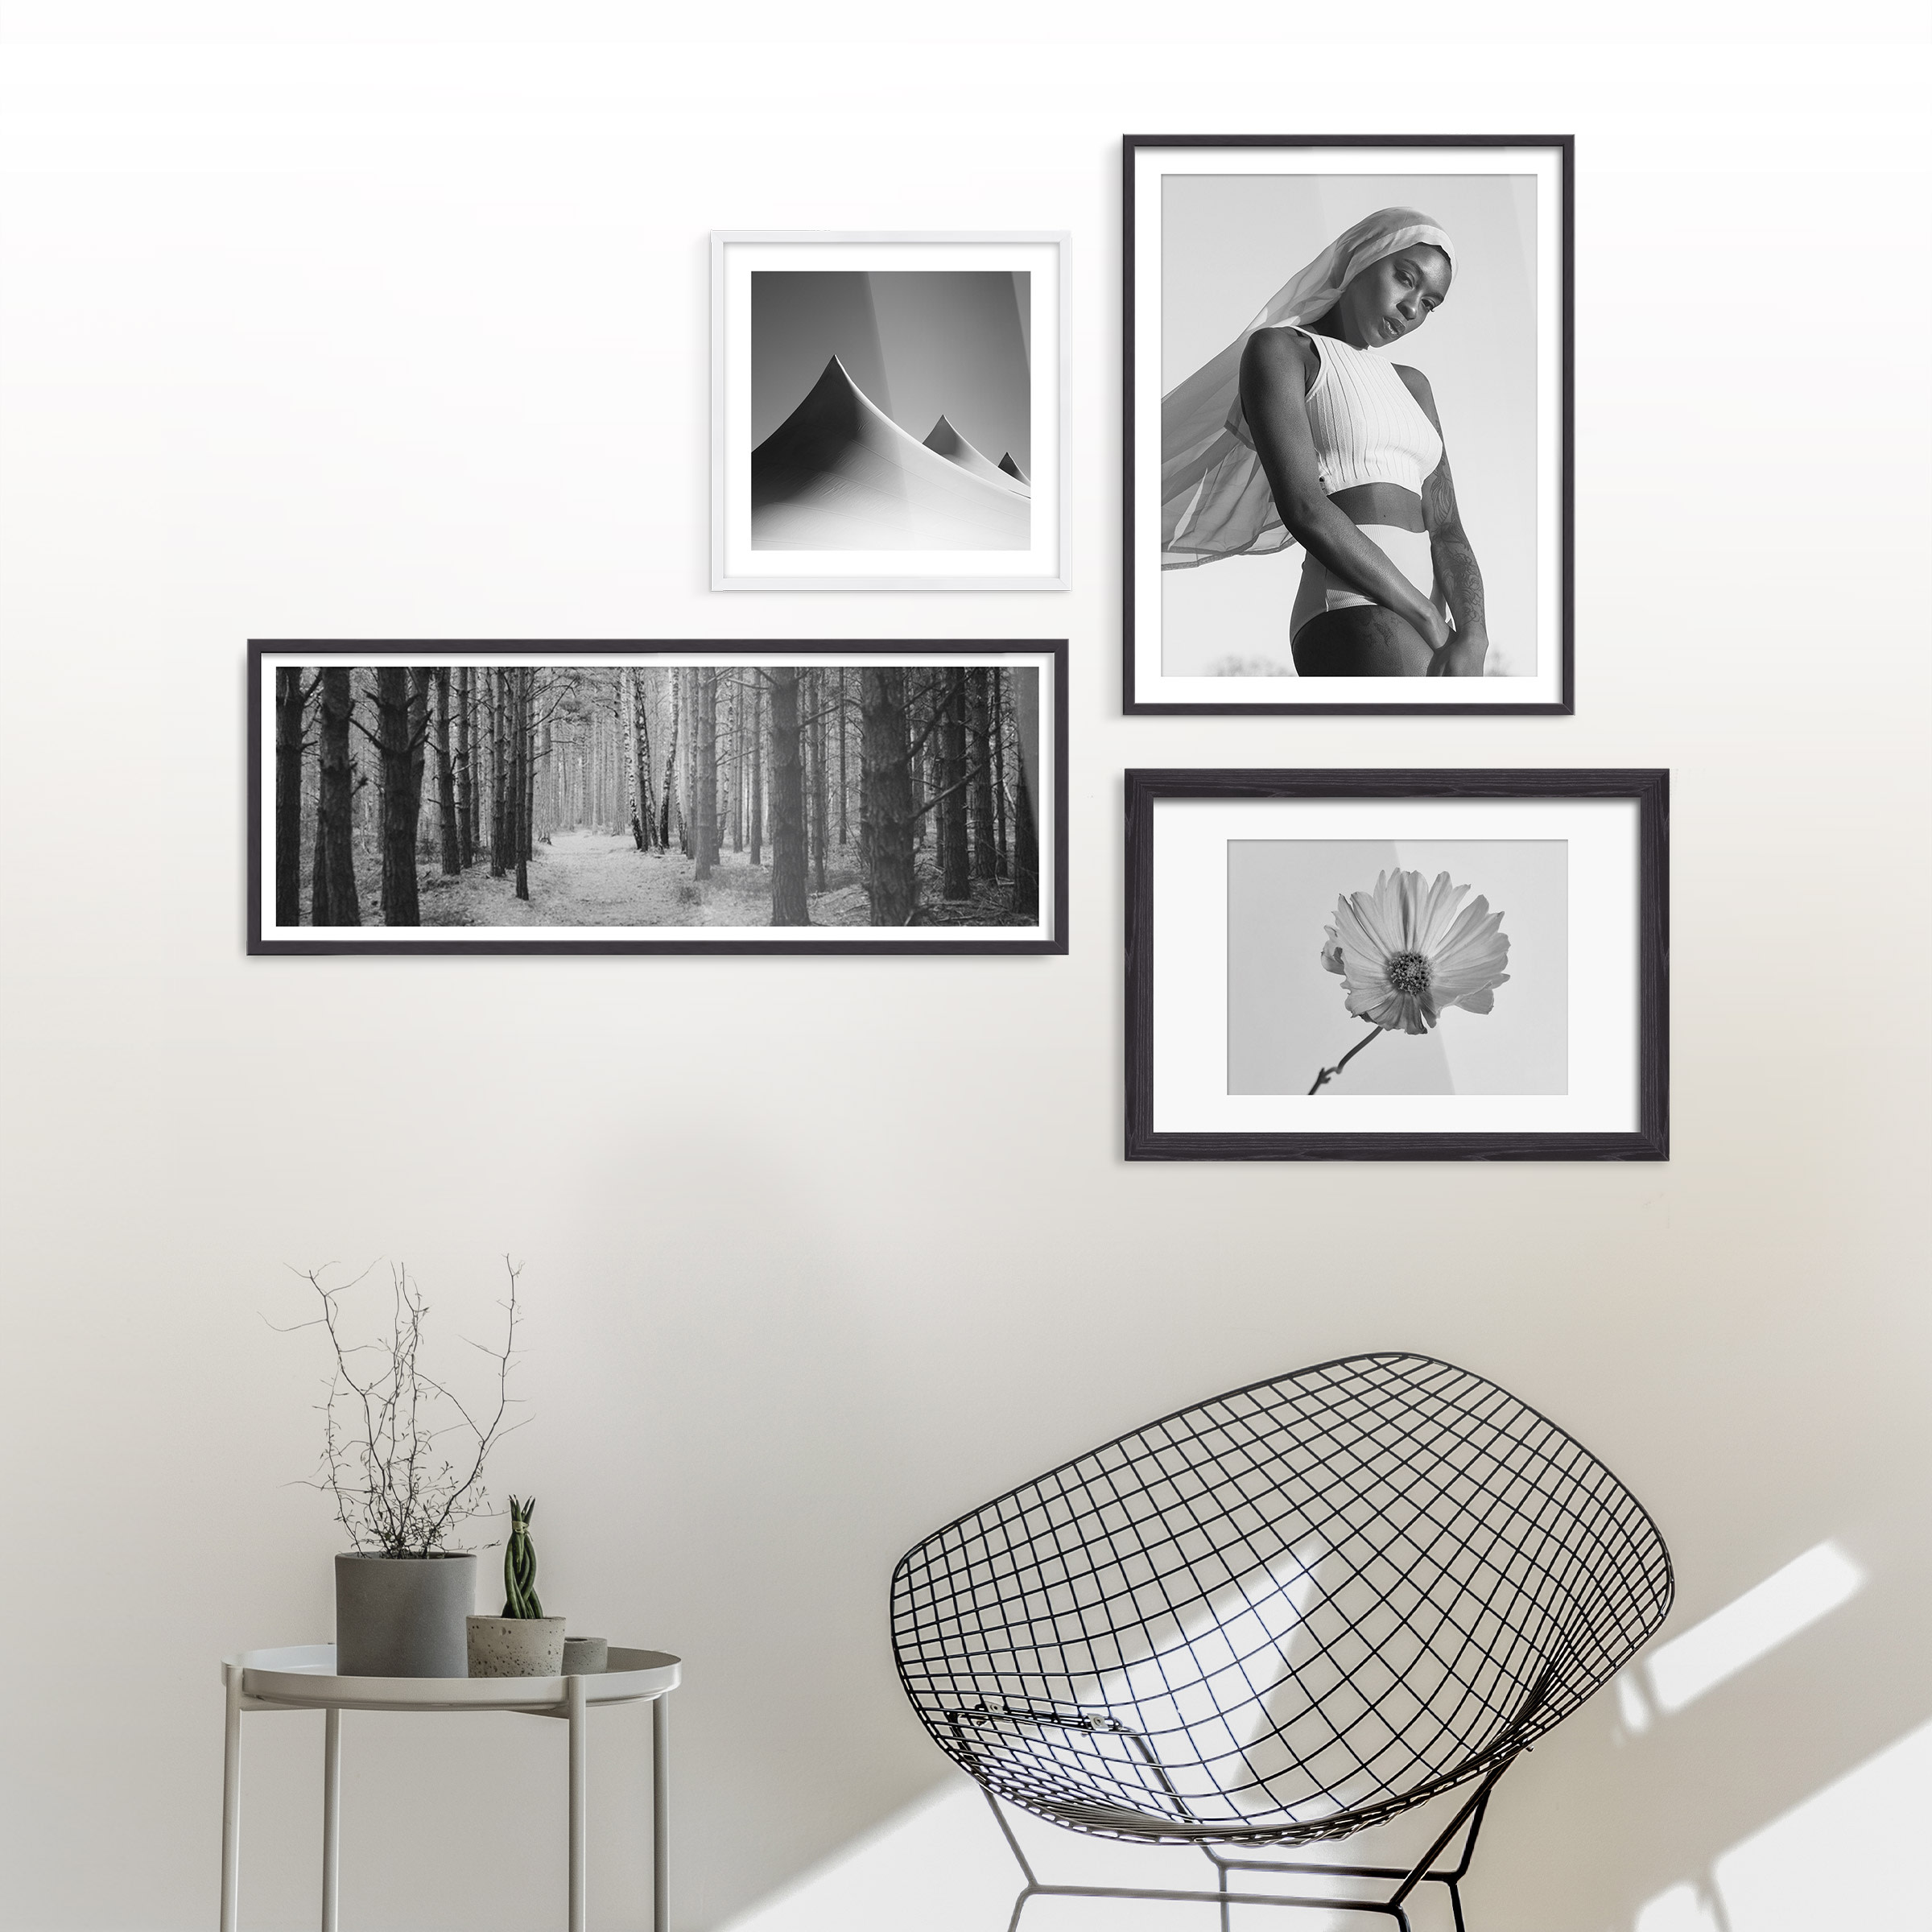 print-on-ilford-bw-paper-portrait-inspiration-1200x1200.jpg